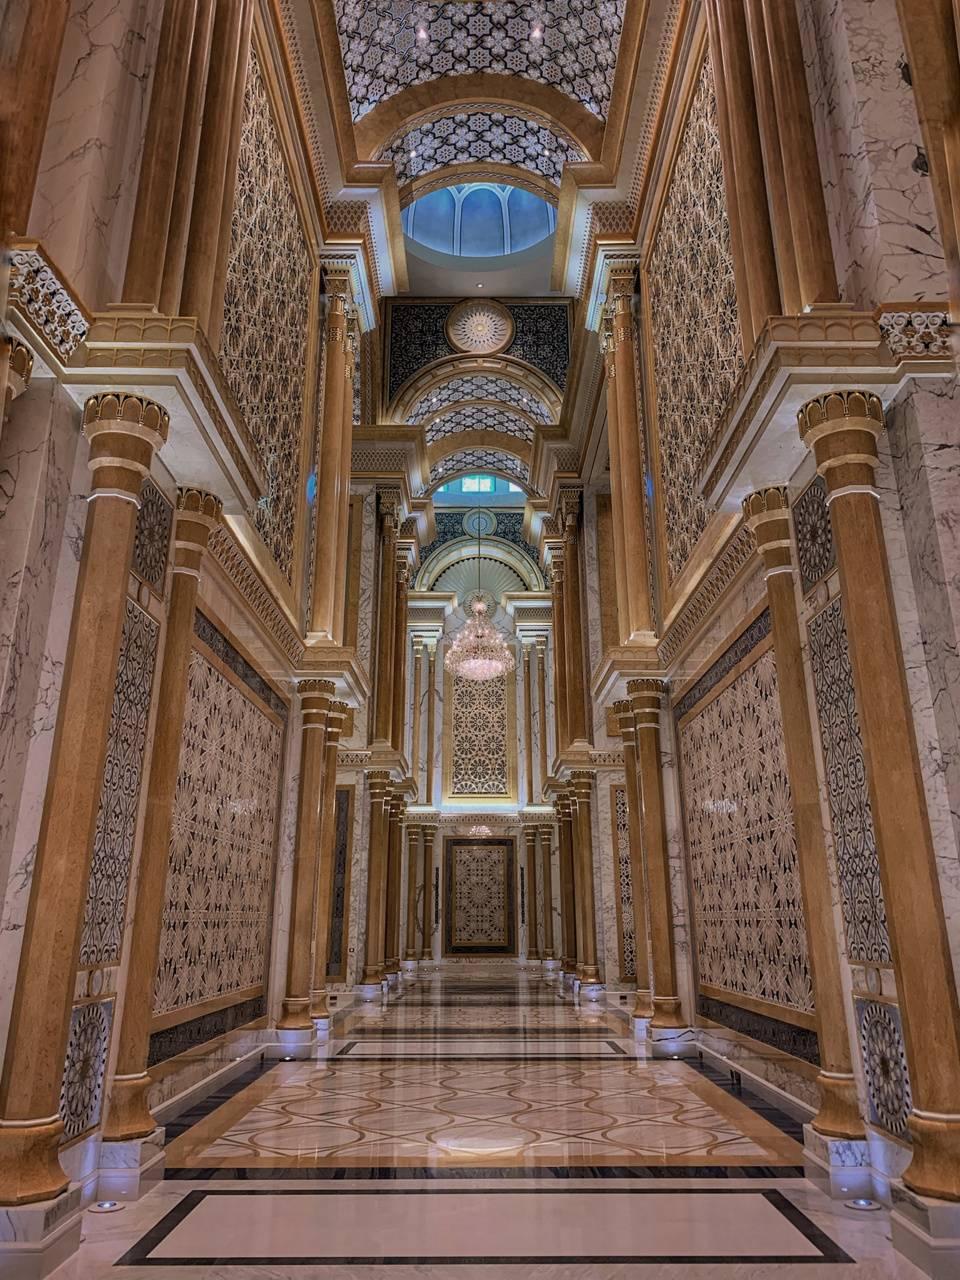 Abudhabi palace